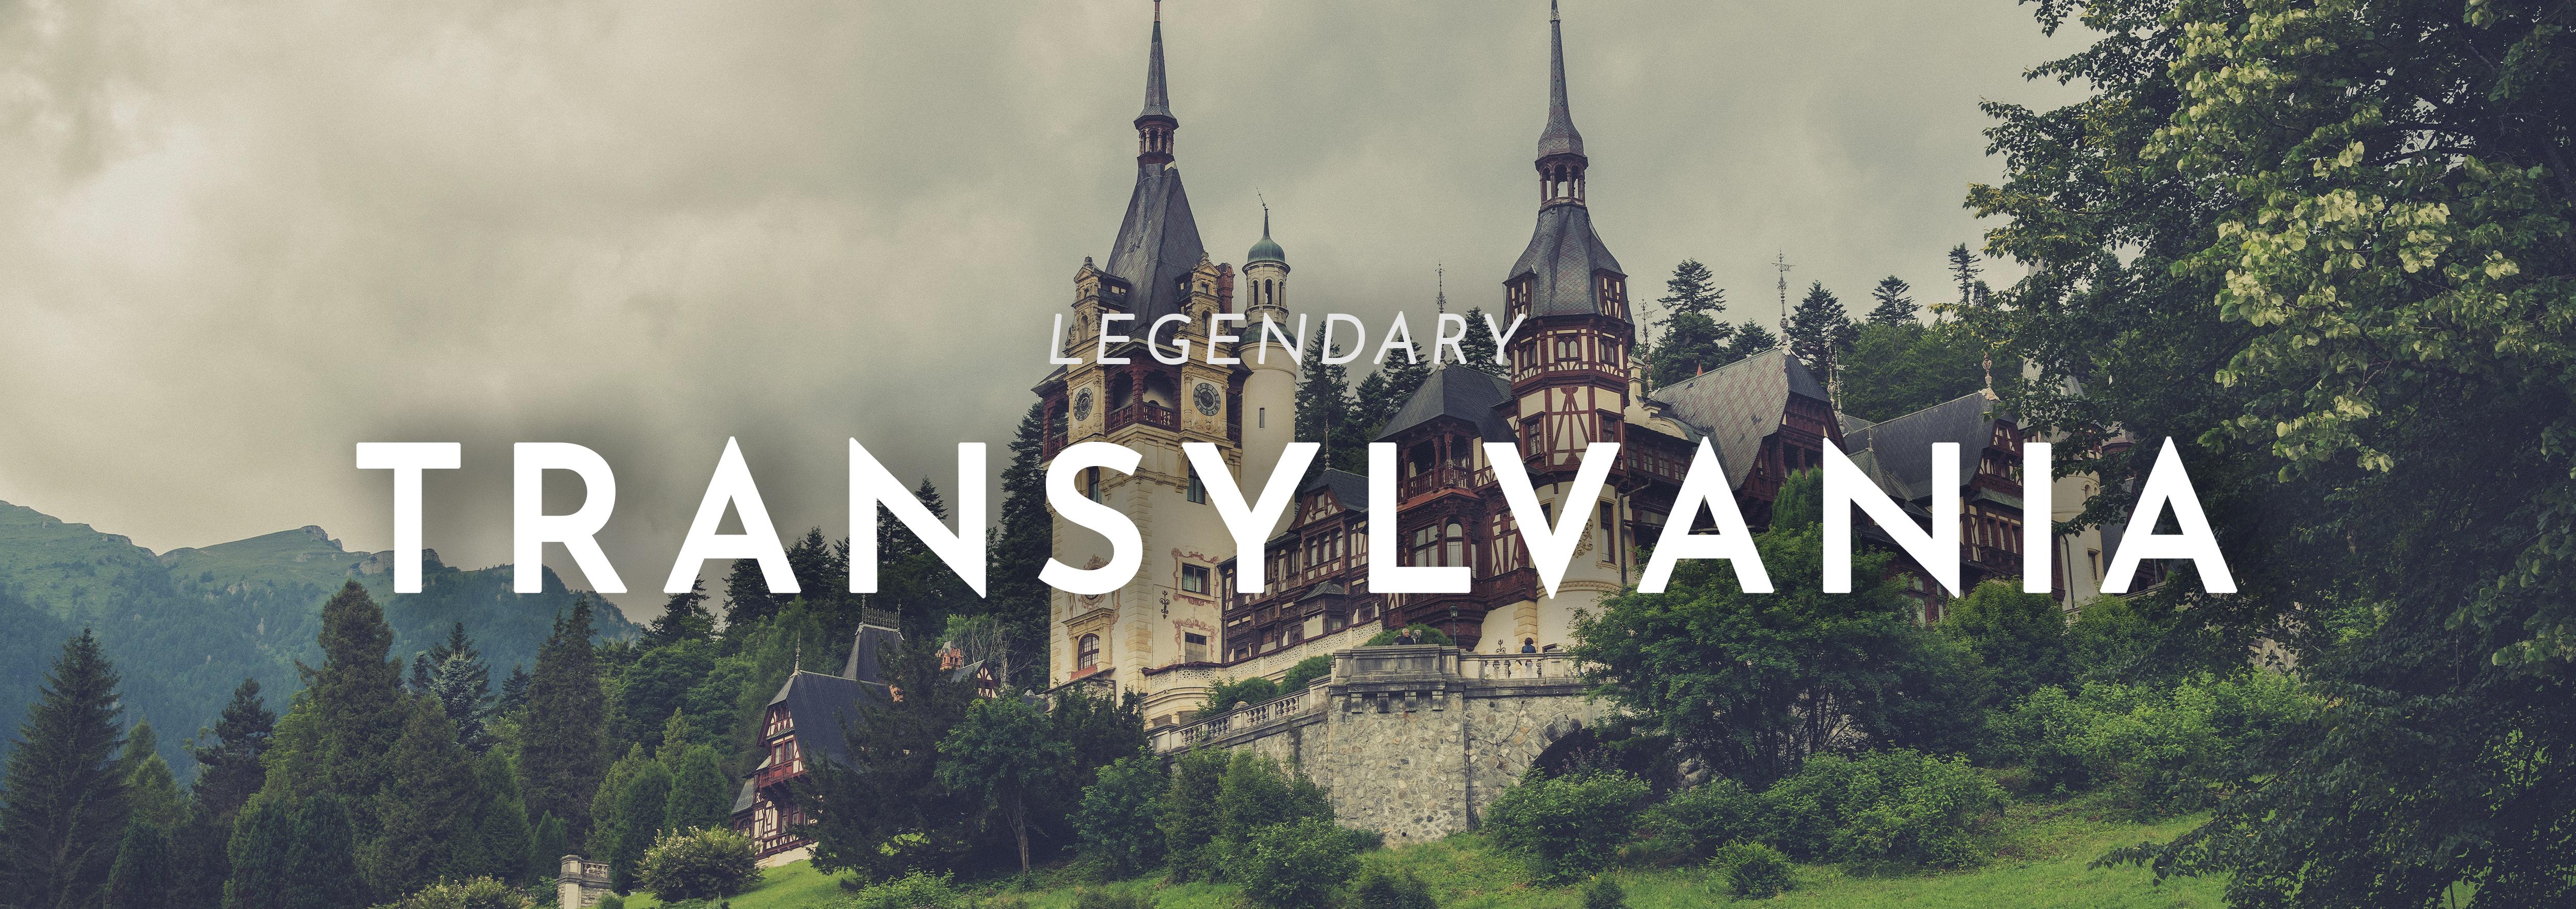 TransylvaniaHeader